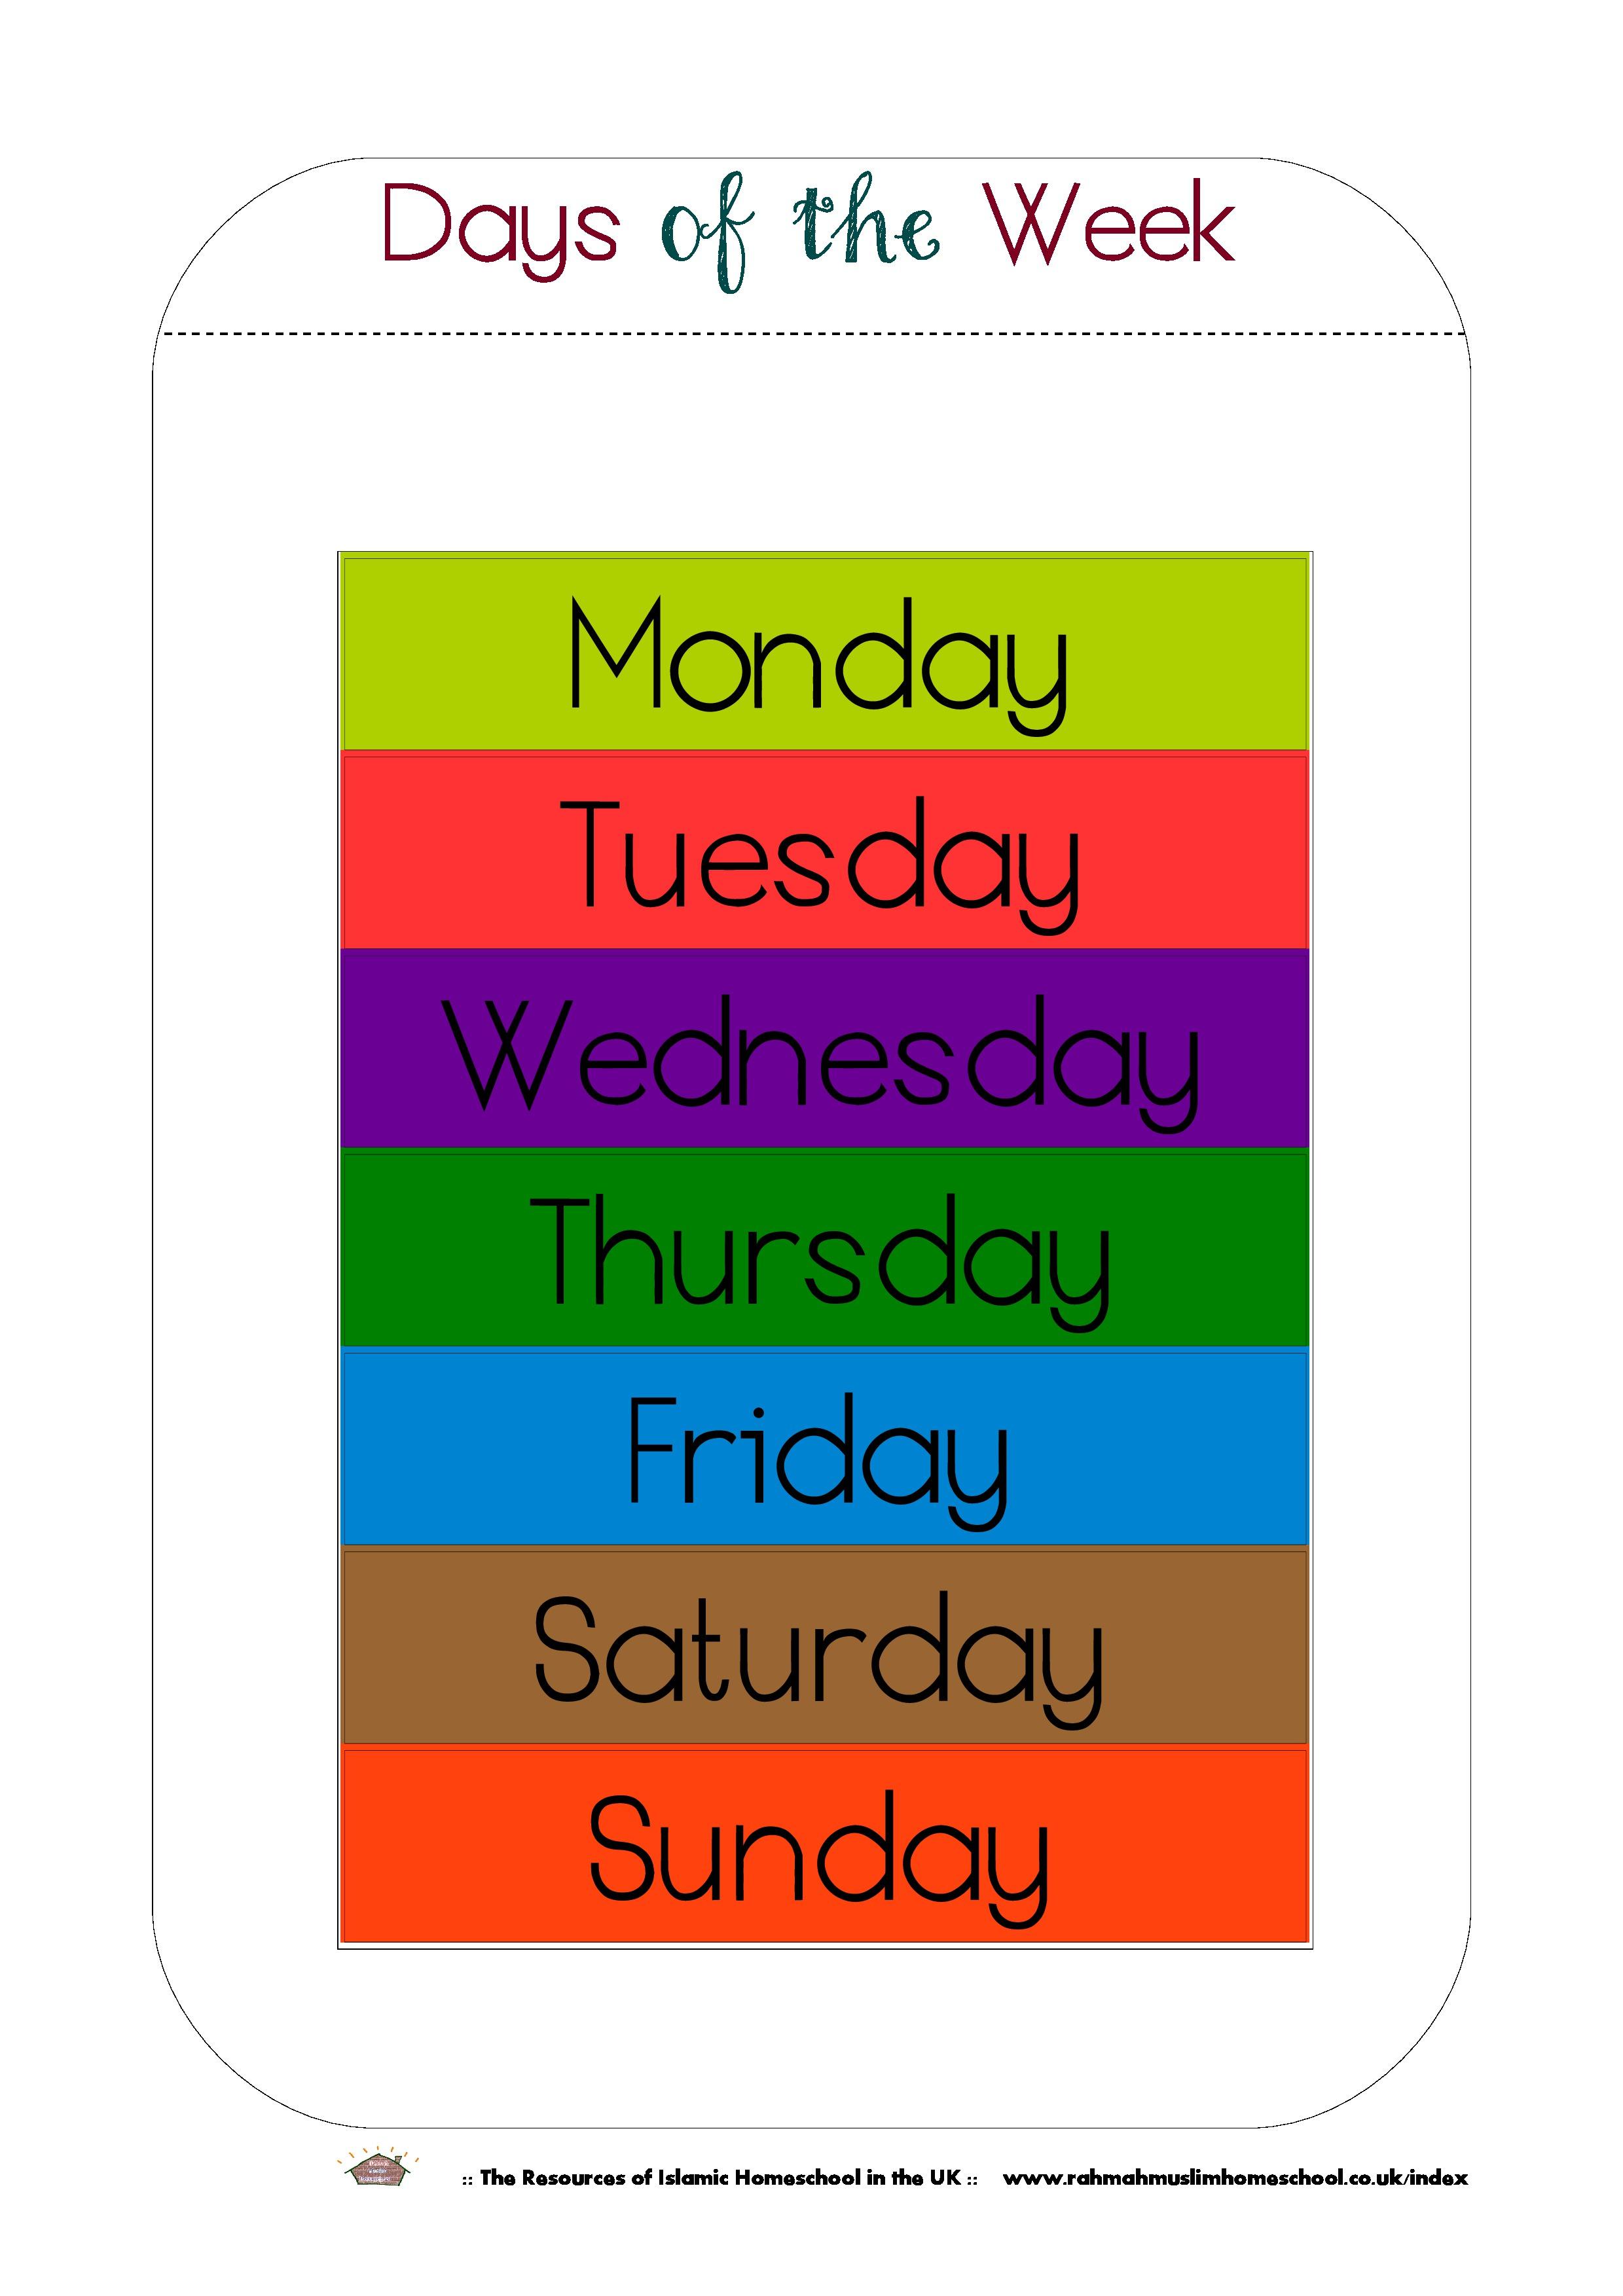 Free Printable Days Of The Week Workbook And Poster   The Resources - Free Printable Days Of The Week